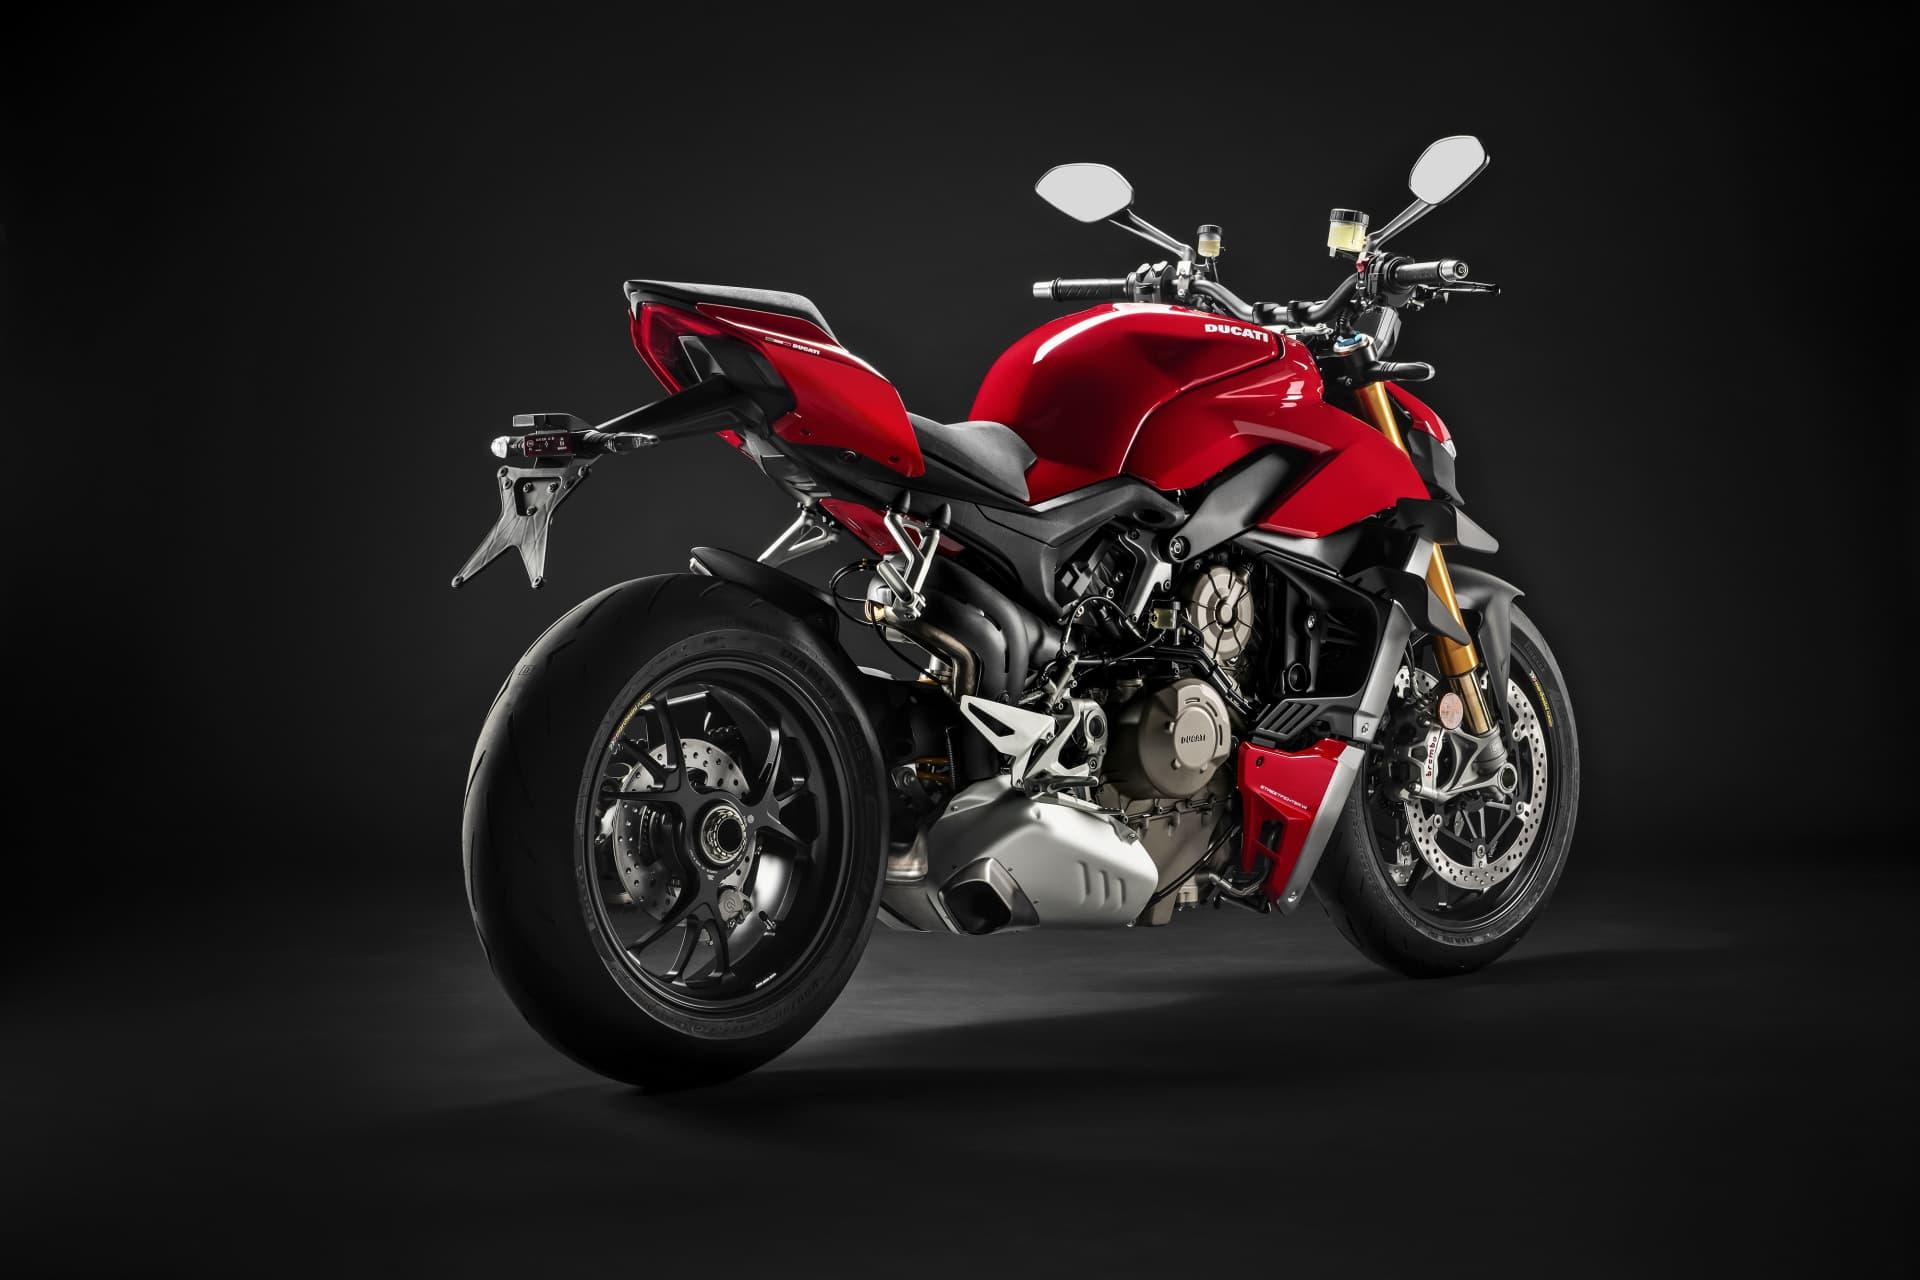 My20 Ducati Streetfigher V4 S 06 Uc101691 Mid